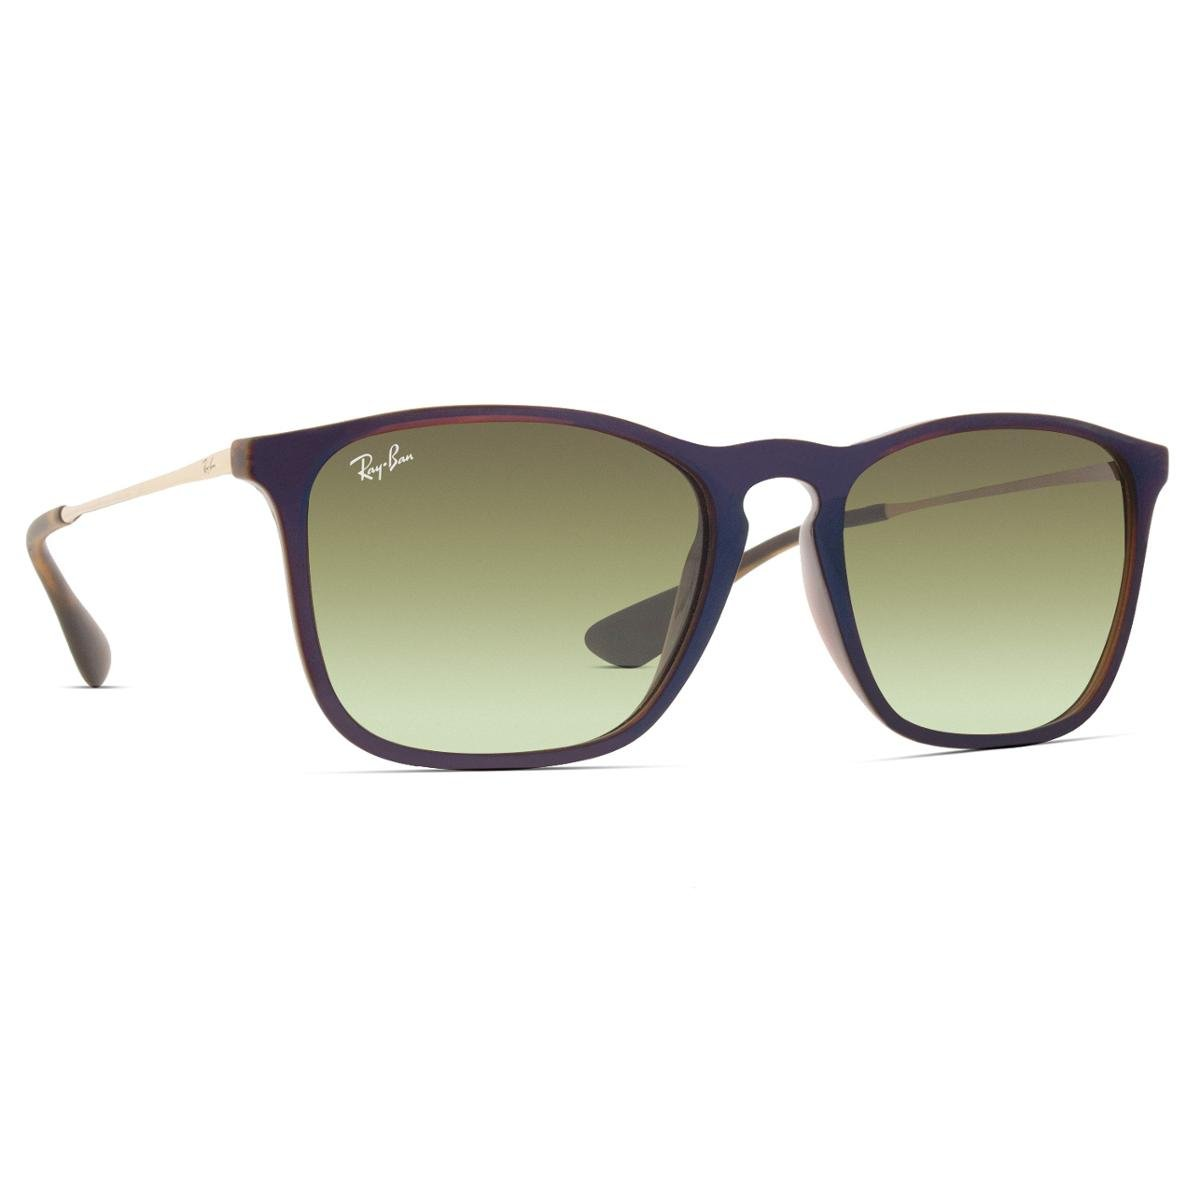 15e265c523167 Óculos de Sol Oakley Holbrook Metal - Compre Agora   Zattini